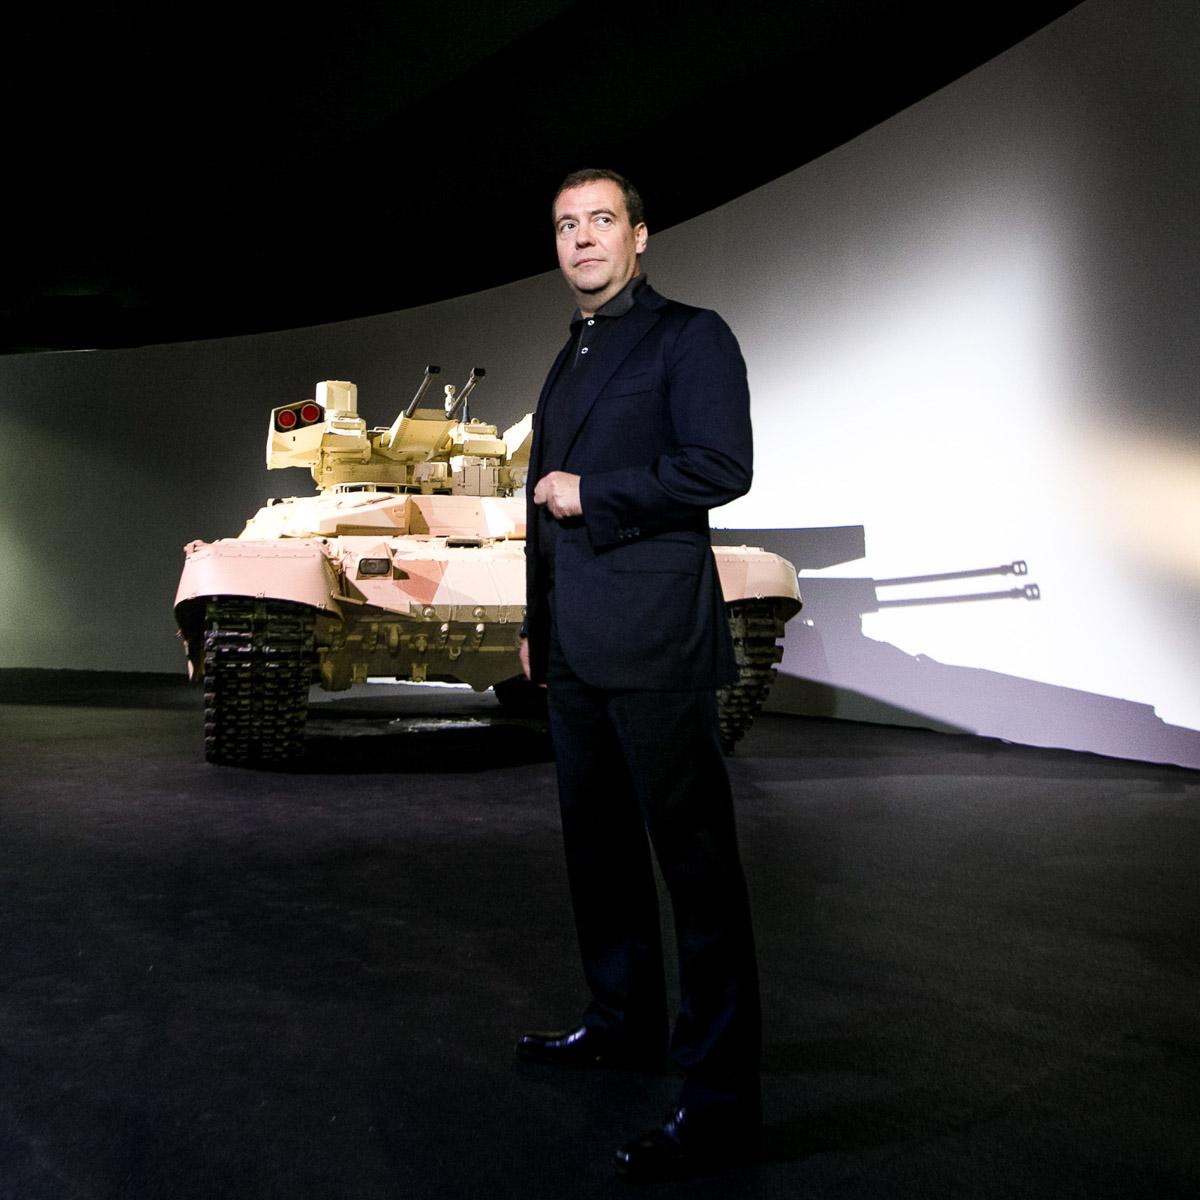 Dmitry Medvedev / UVZ